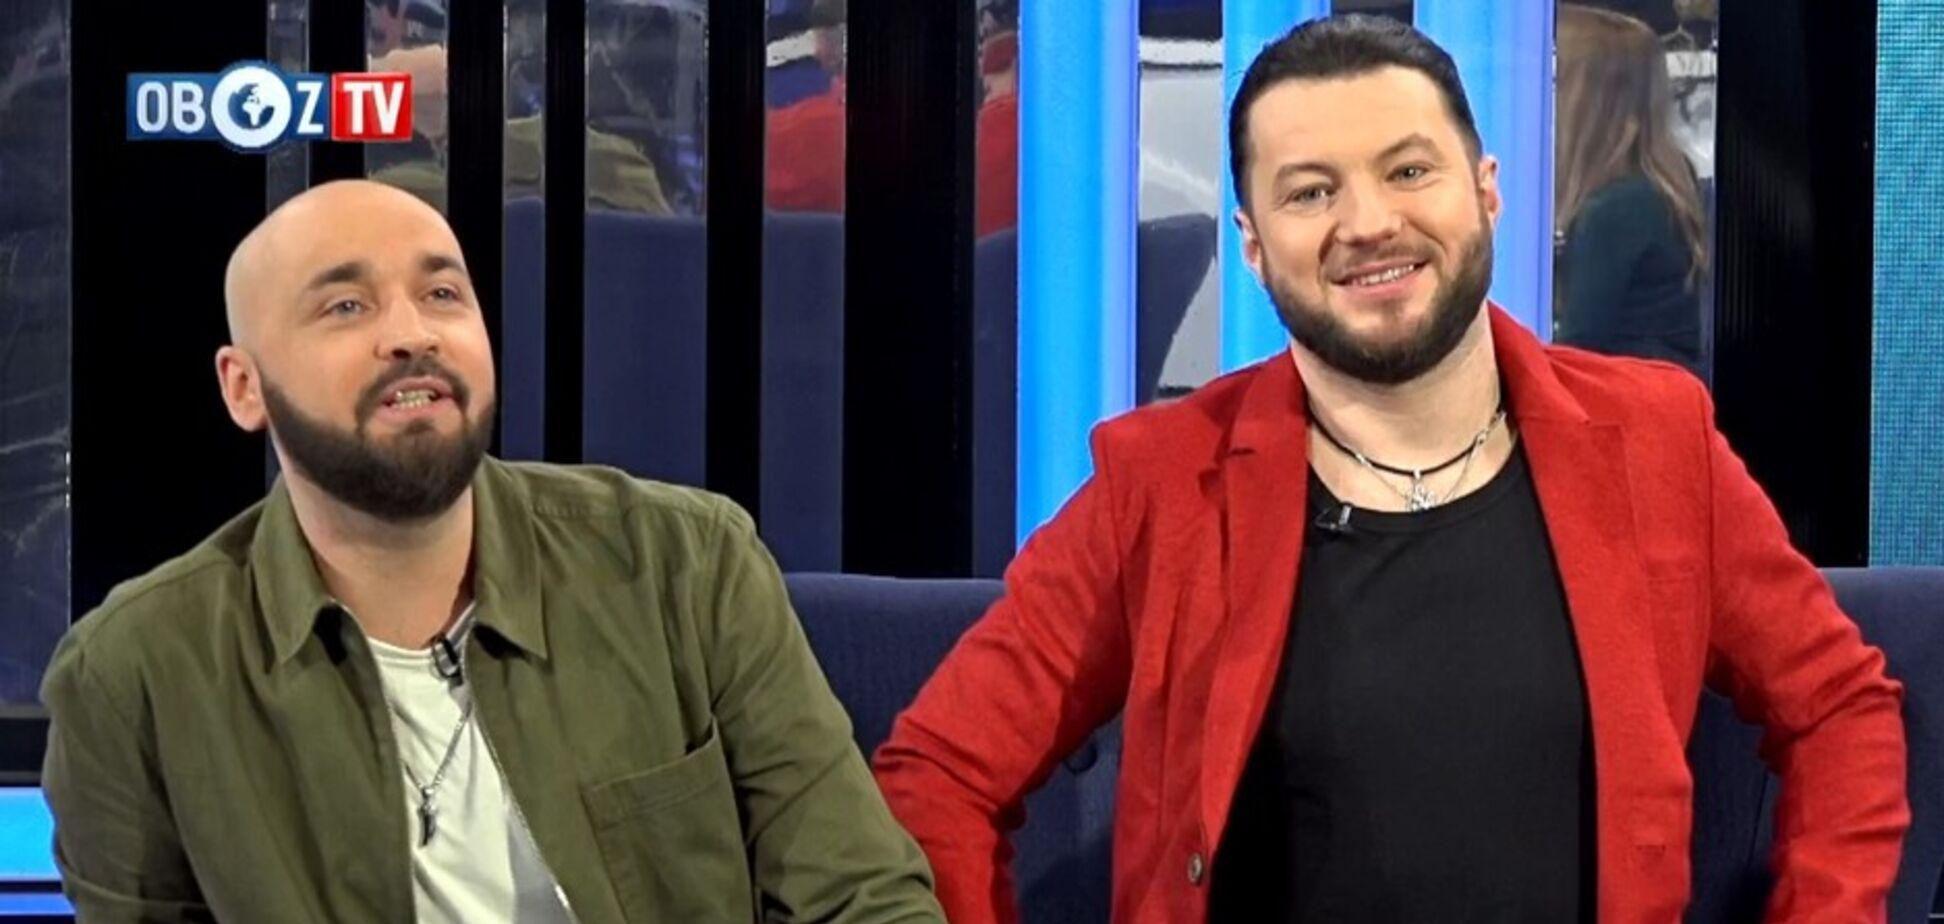 Группа 'АВИАТОР' стали гостями инфо-панк шоу 'Бурчук Live'